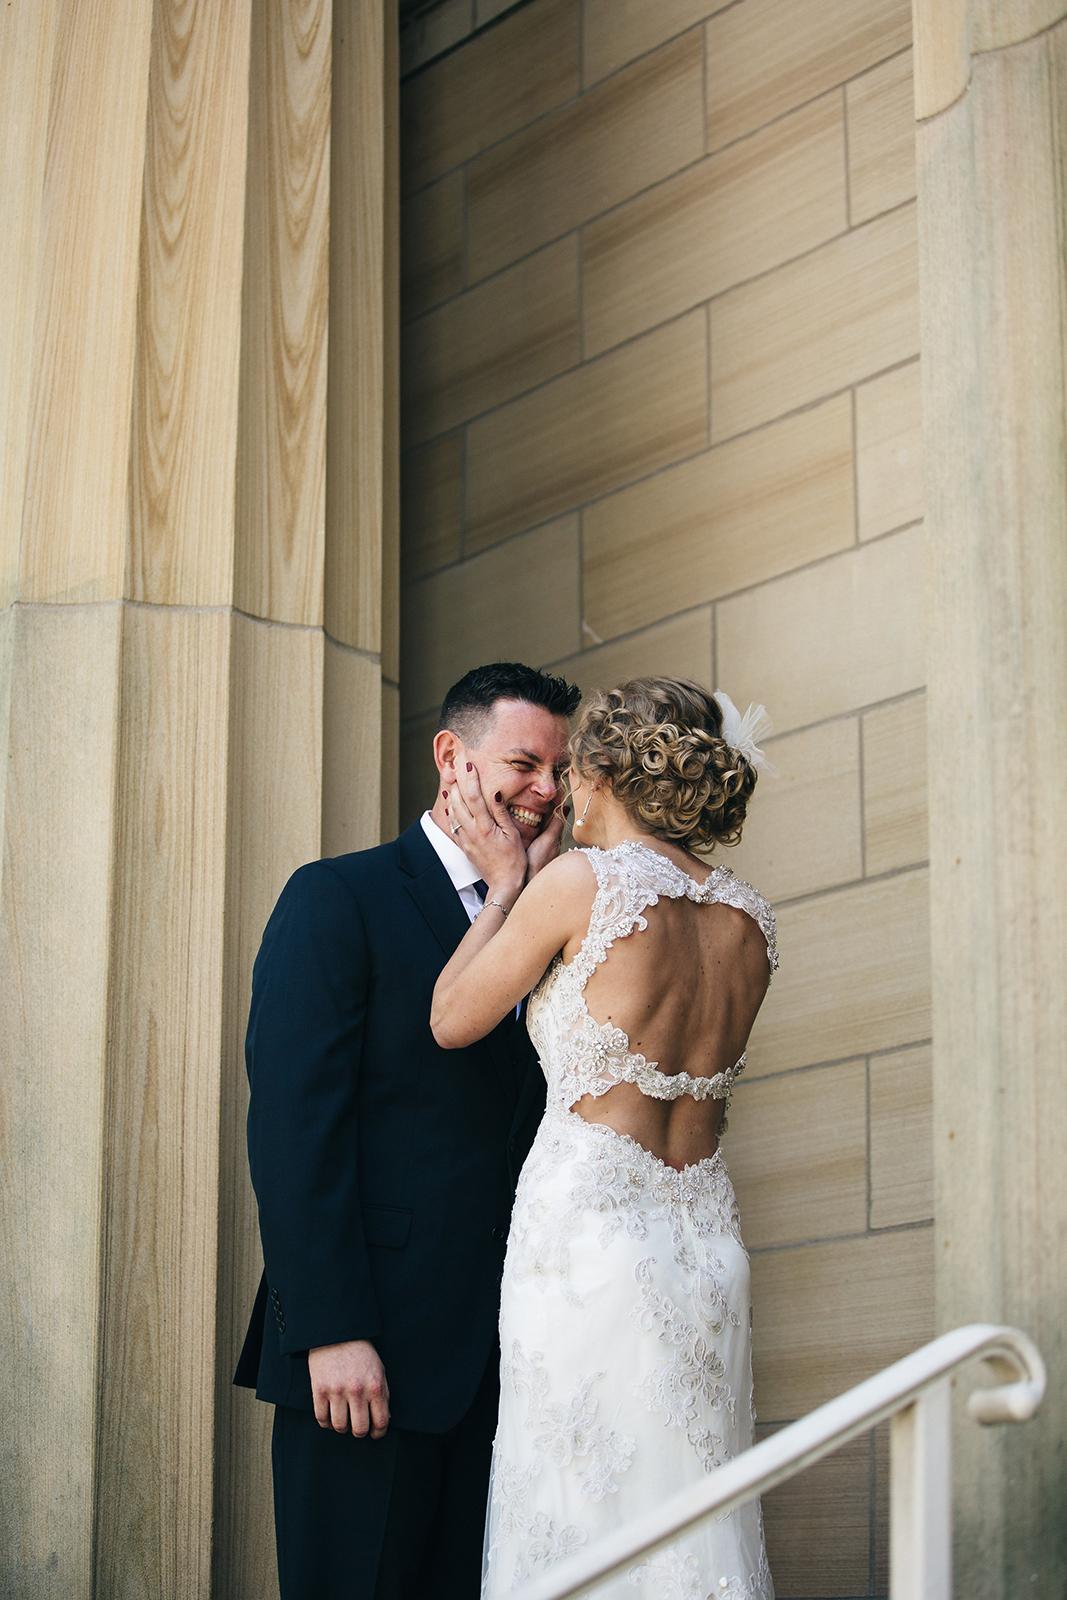 Bride and groom first look in Sandusky, Ohio.